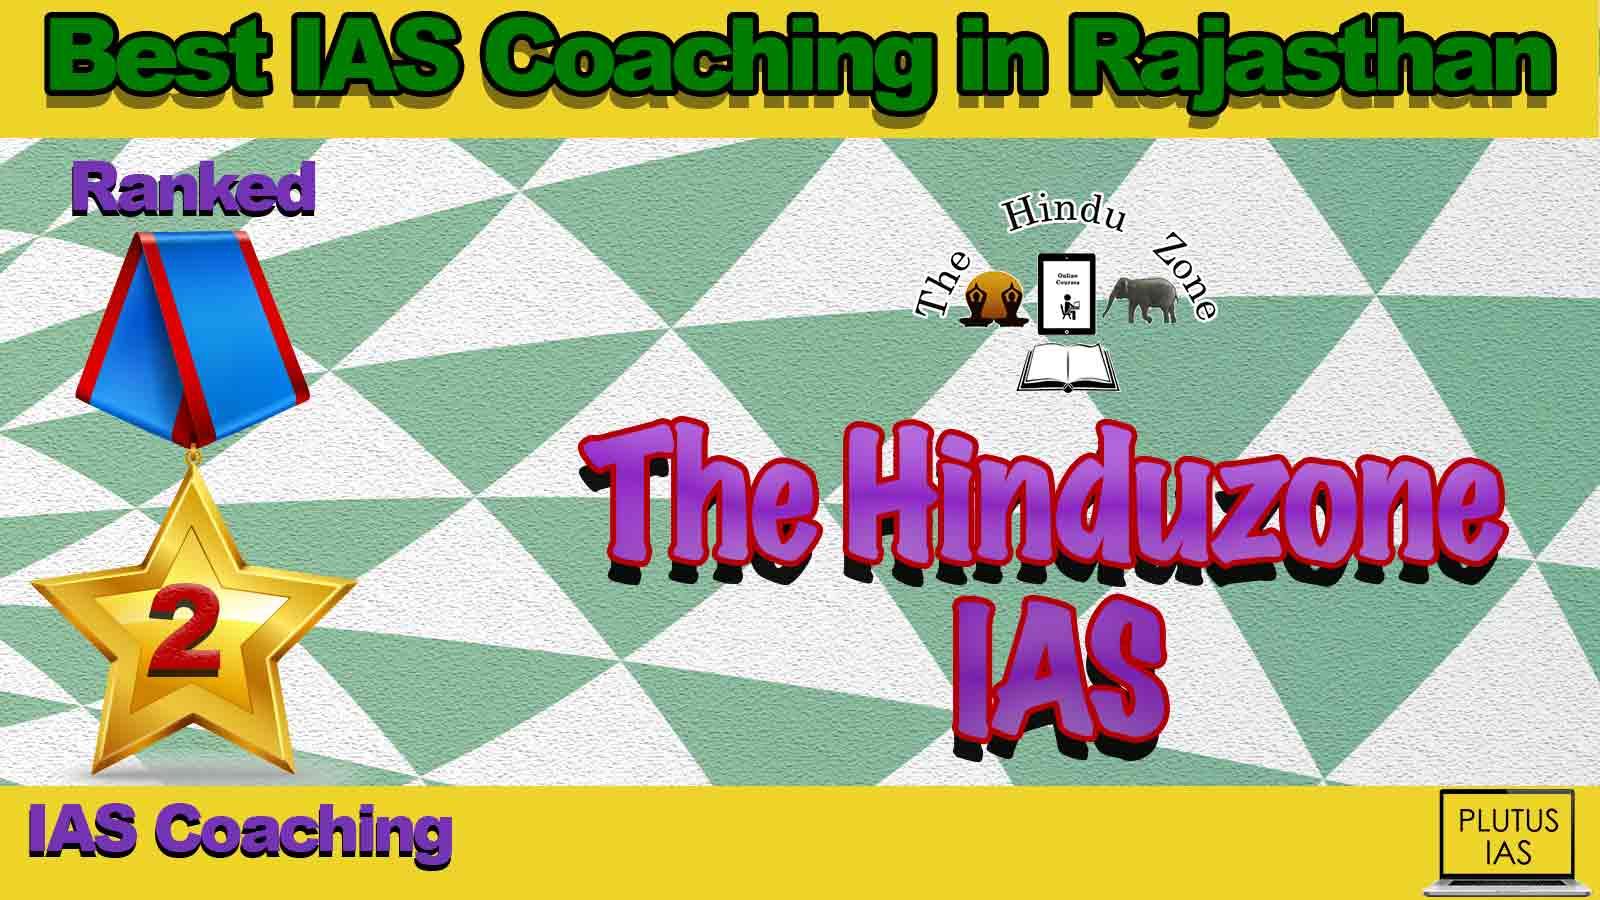 Best IAS Coaching in Rajasthan